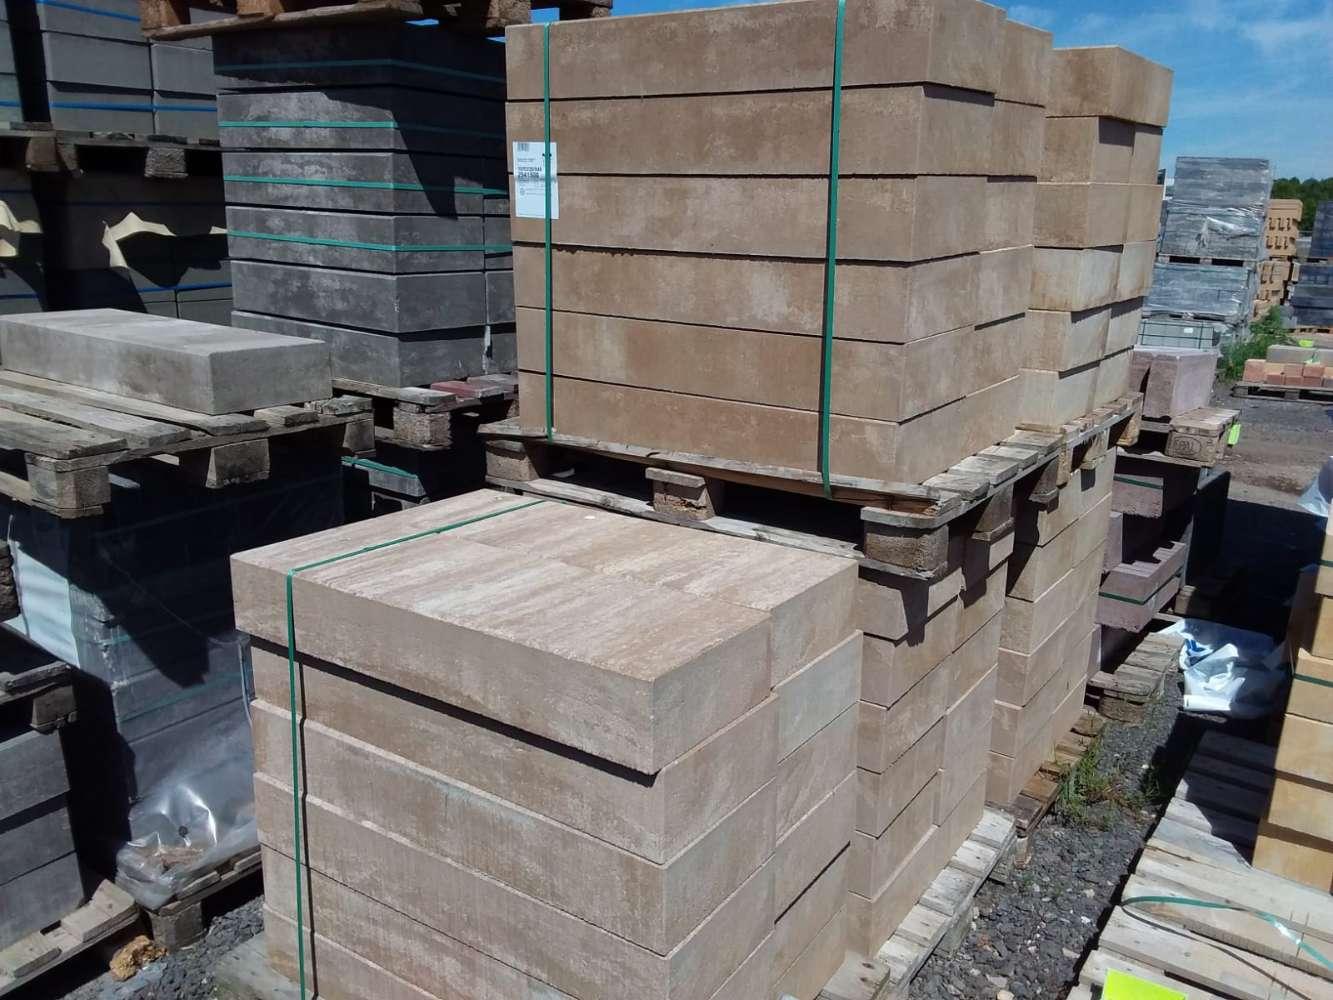 Stratos Blockstufen Canyonbraun 100x35x15 cm (2.Wahl)